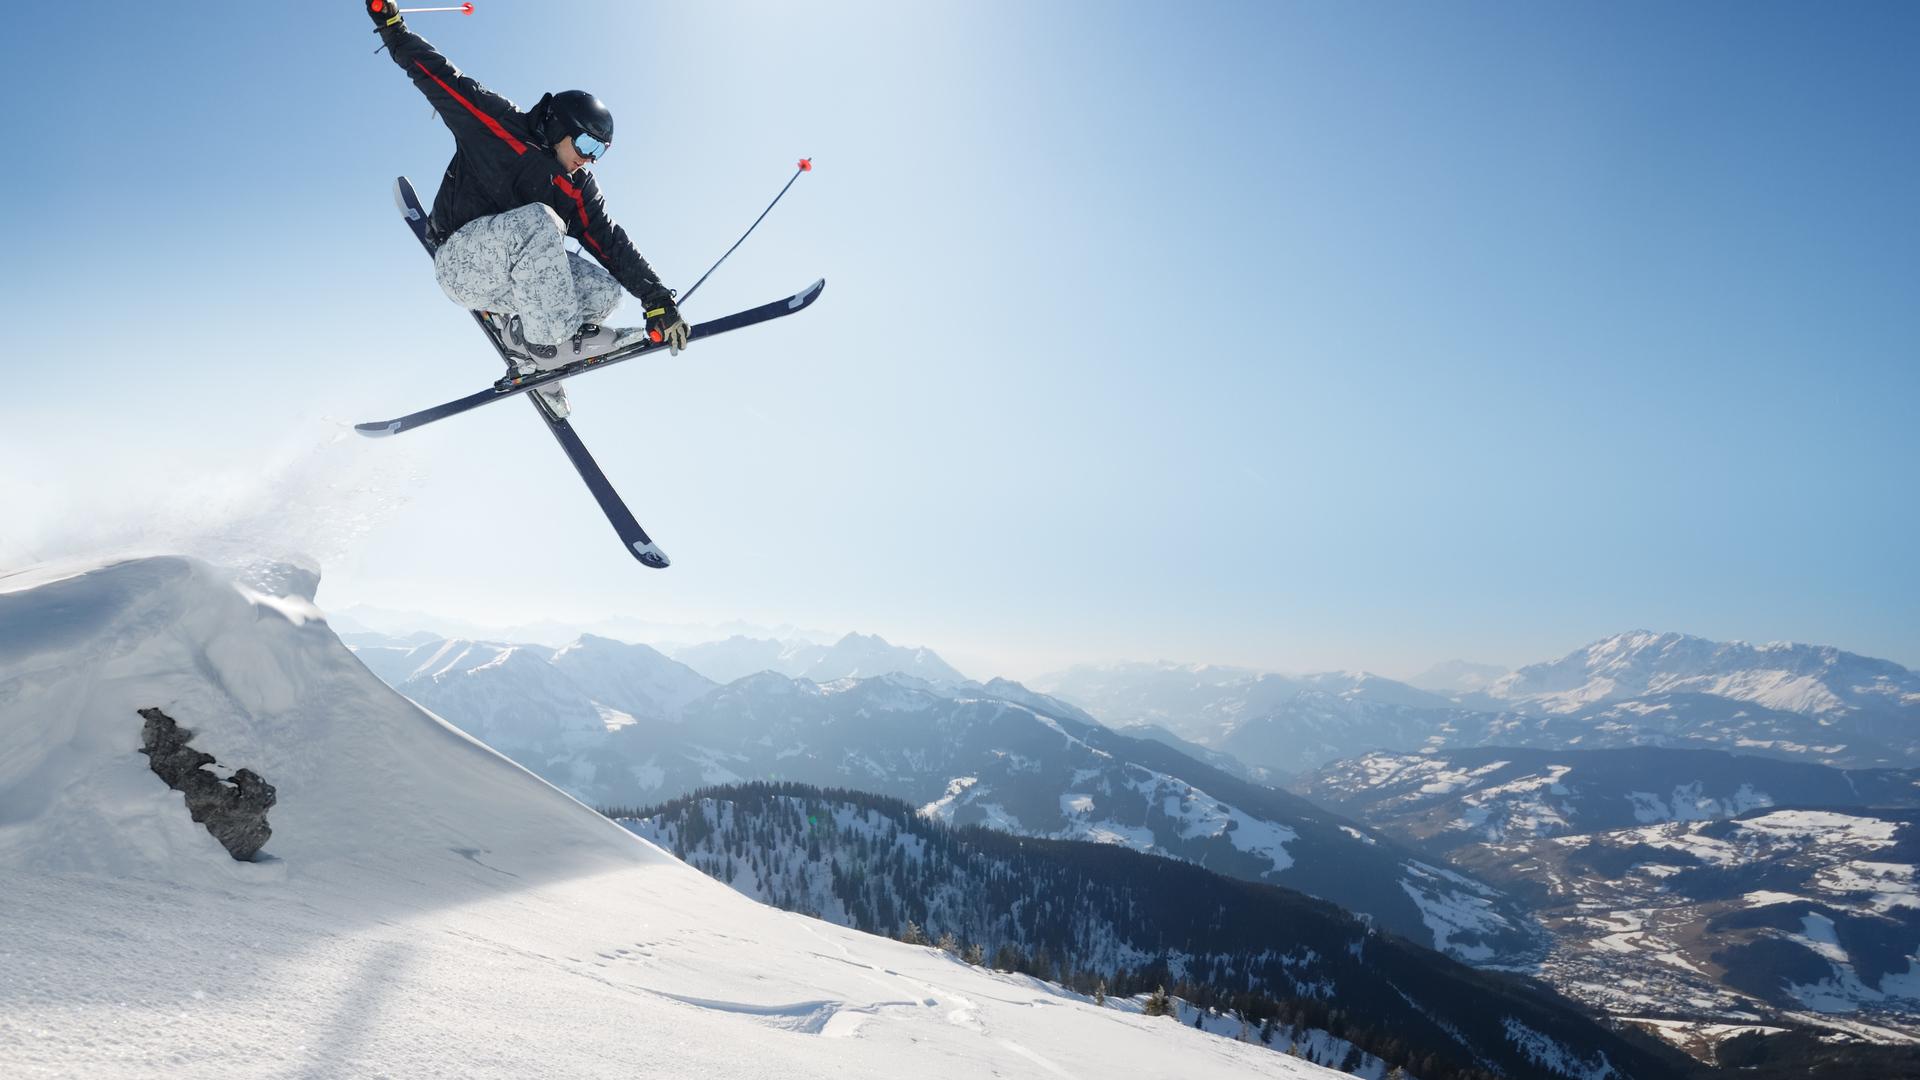 Ski jump 4K Ultra HD wallpaper 4k WallpaperNet 1920x1080